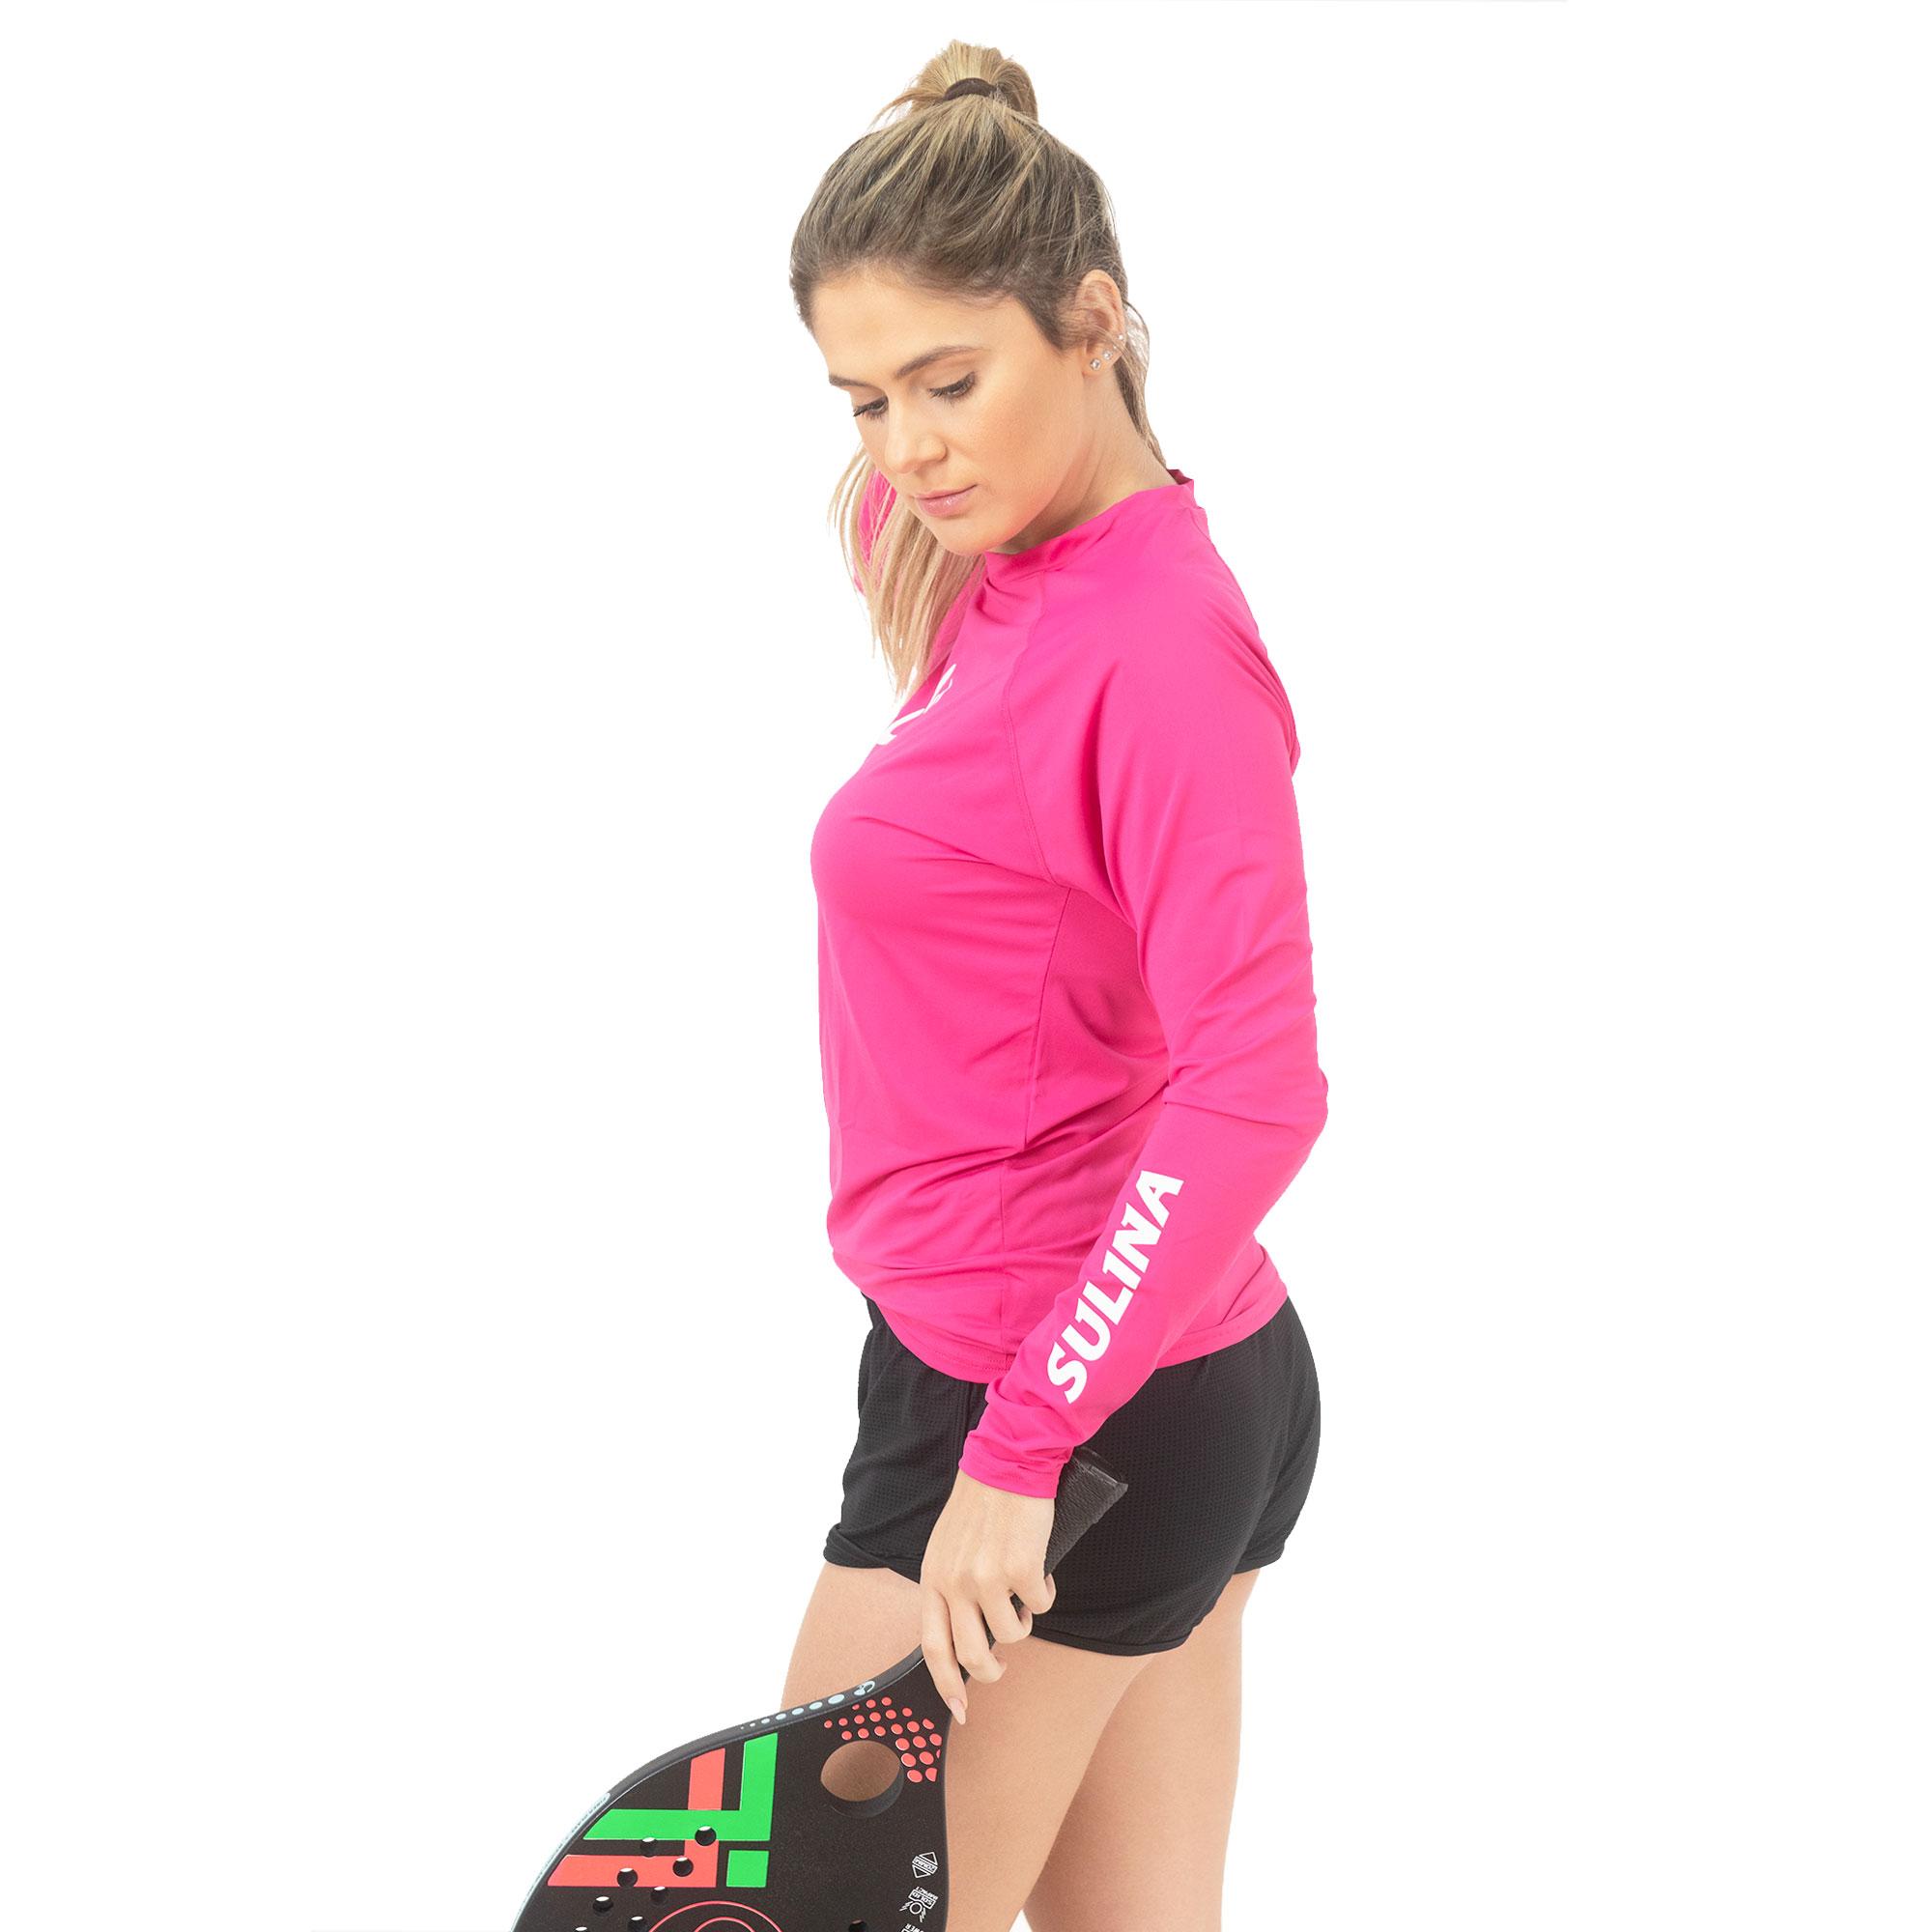 Camiseta Sulina Manga Longa UV 50+  Térmica Pink